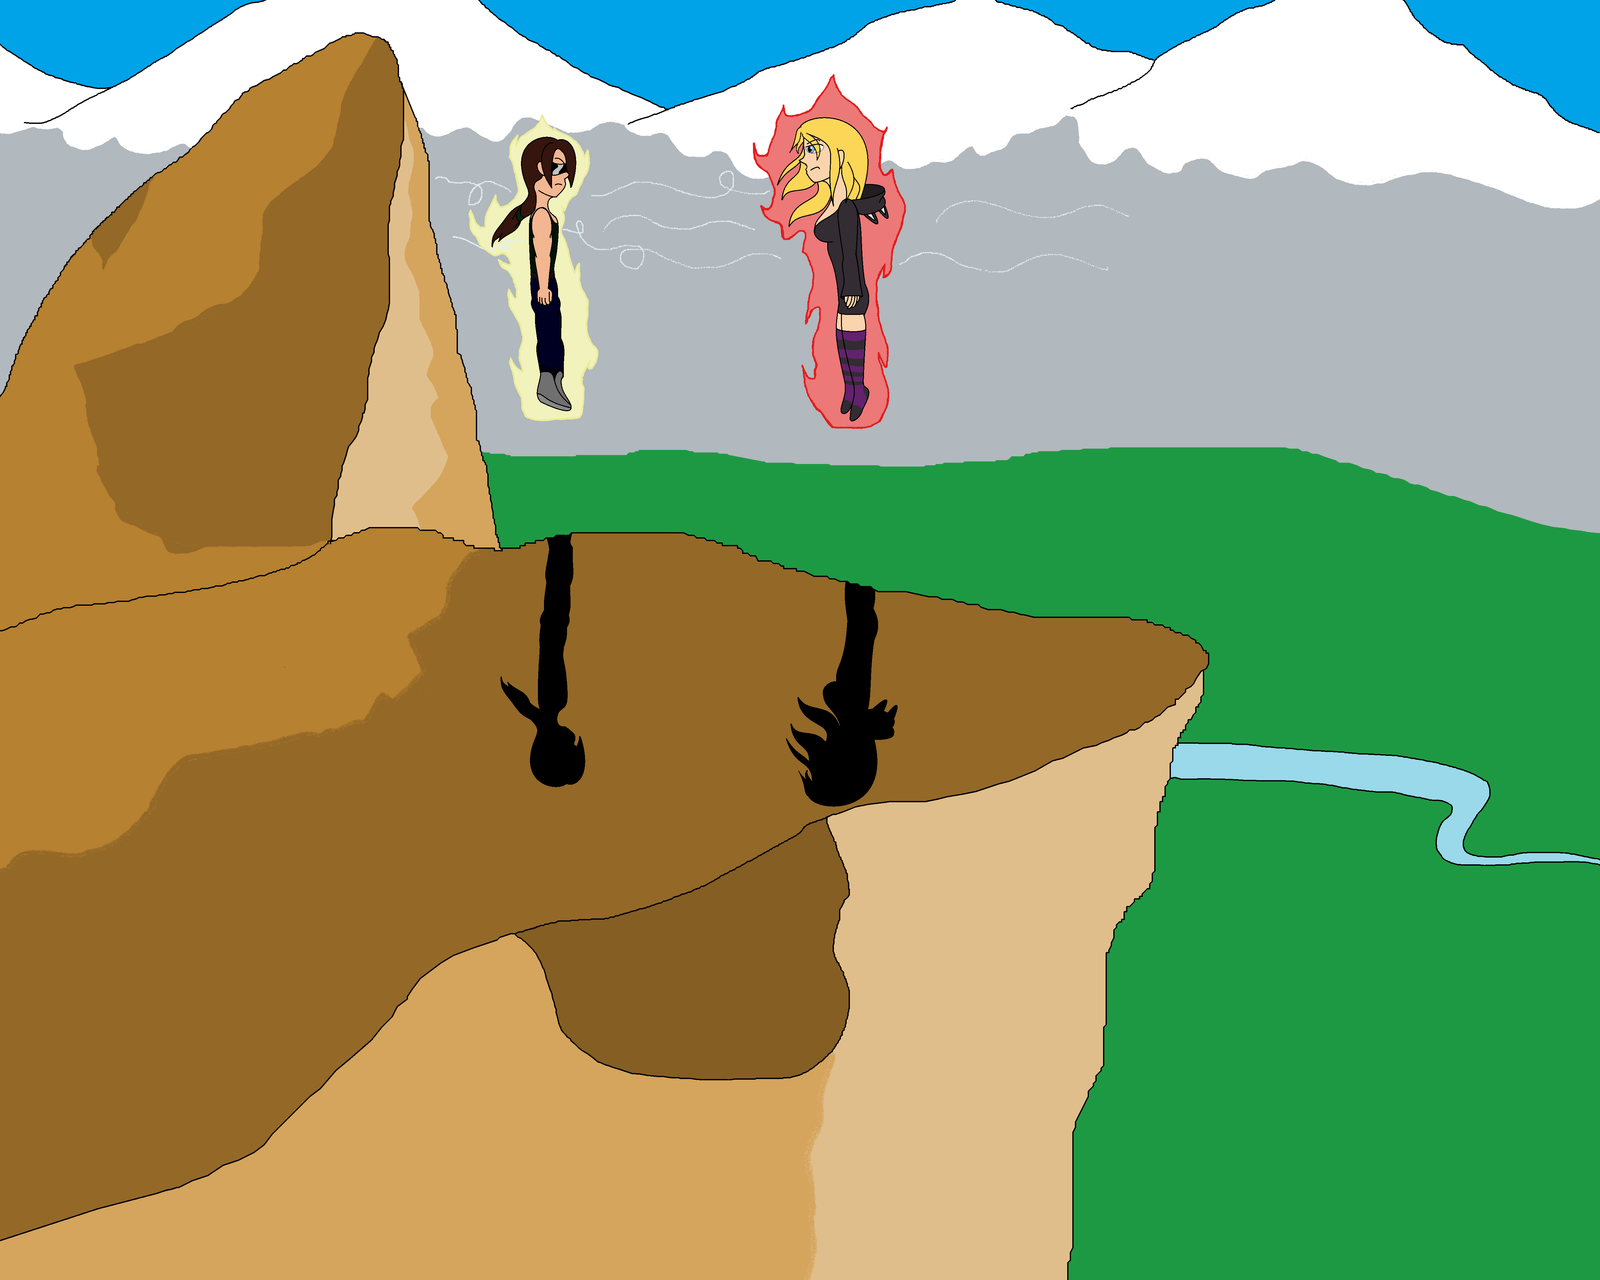 Artist Battle: MasterghostU vs InnocentTazzlet by MasterghostUnlimited